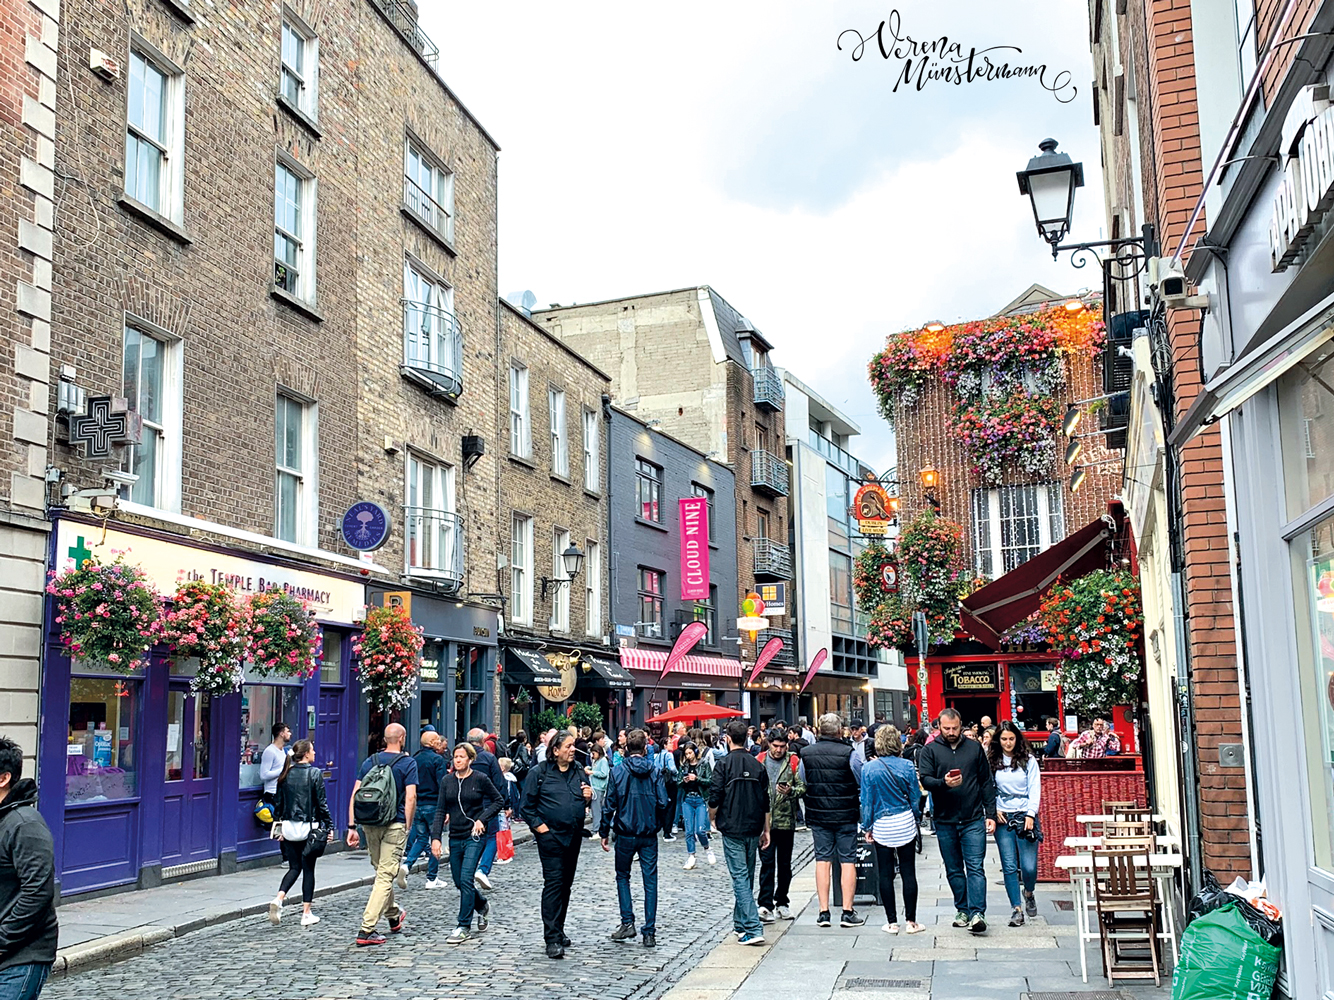 Dublin - Städtetrip - Temple Bar - verenamuenstermann.de